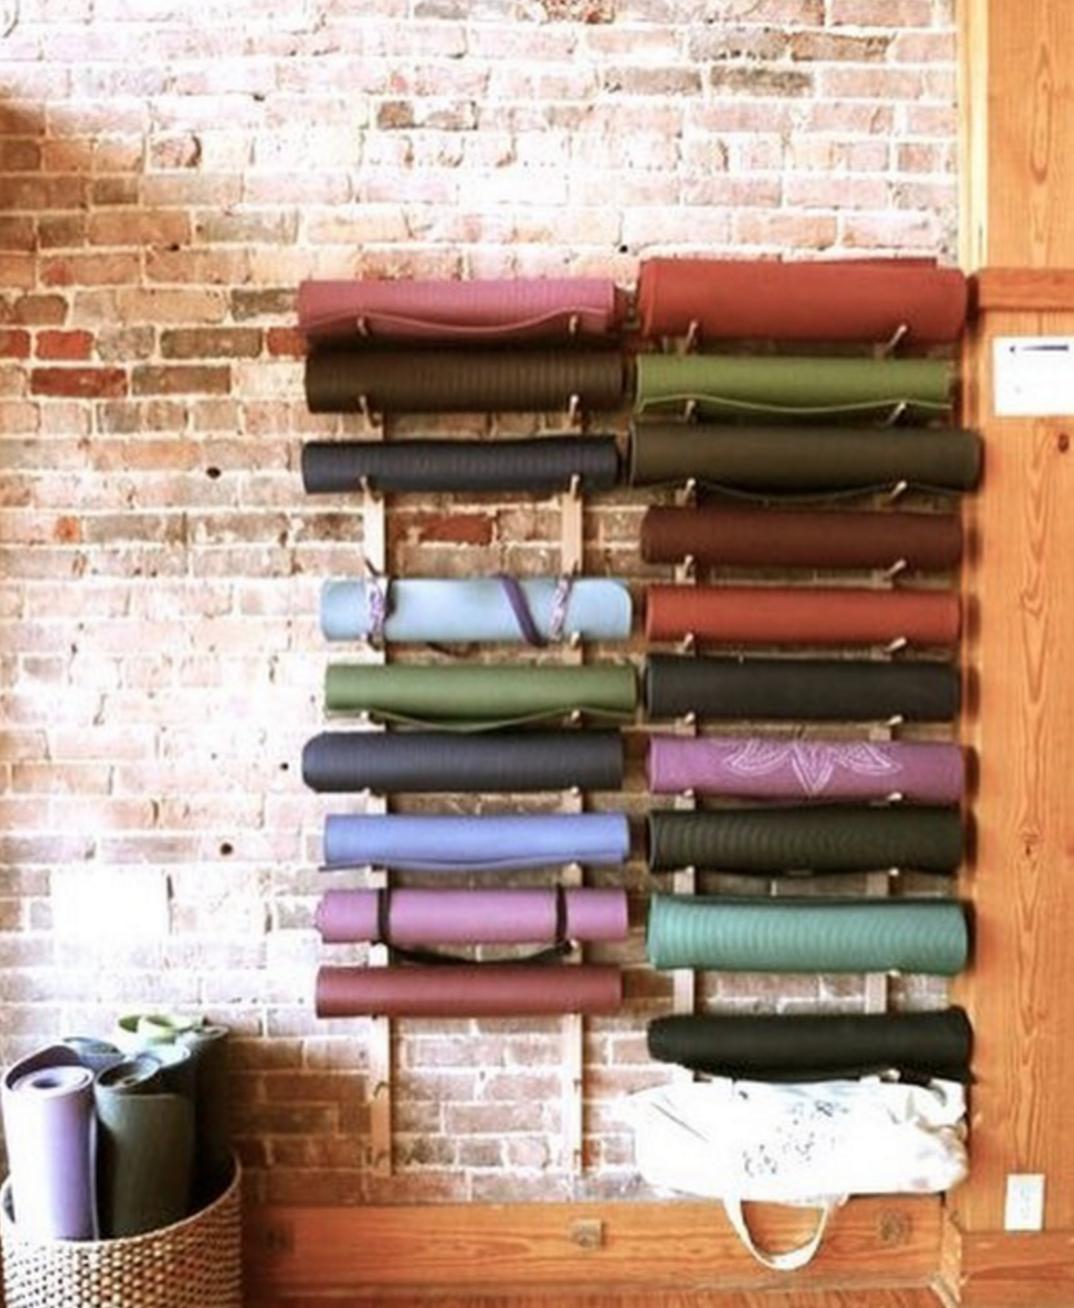 stock a studio basket mat at yoga alamy storage of photo mats